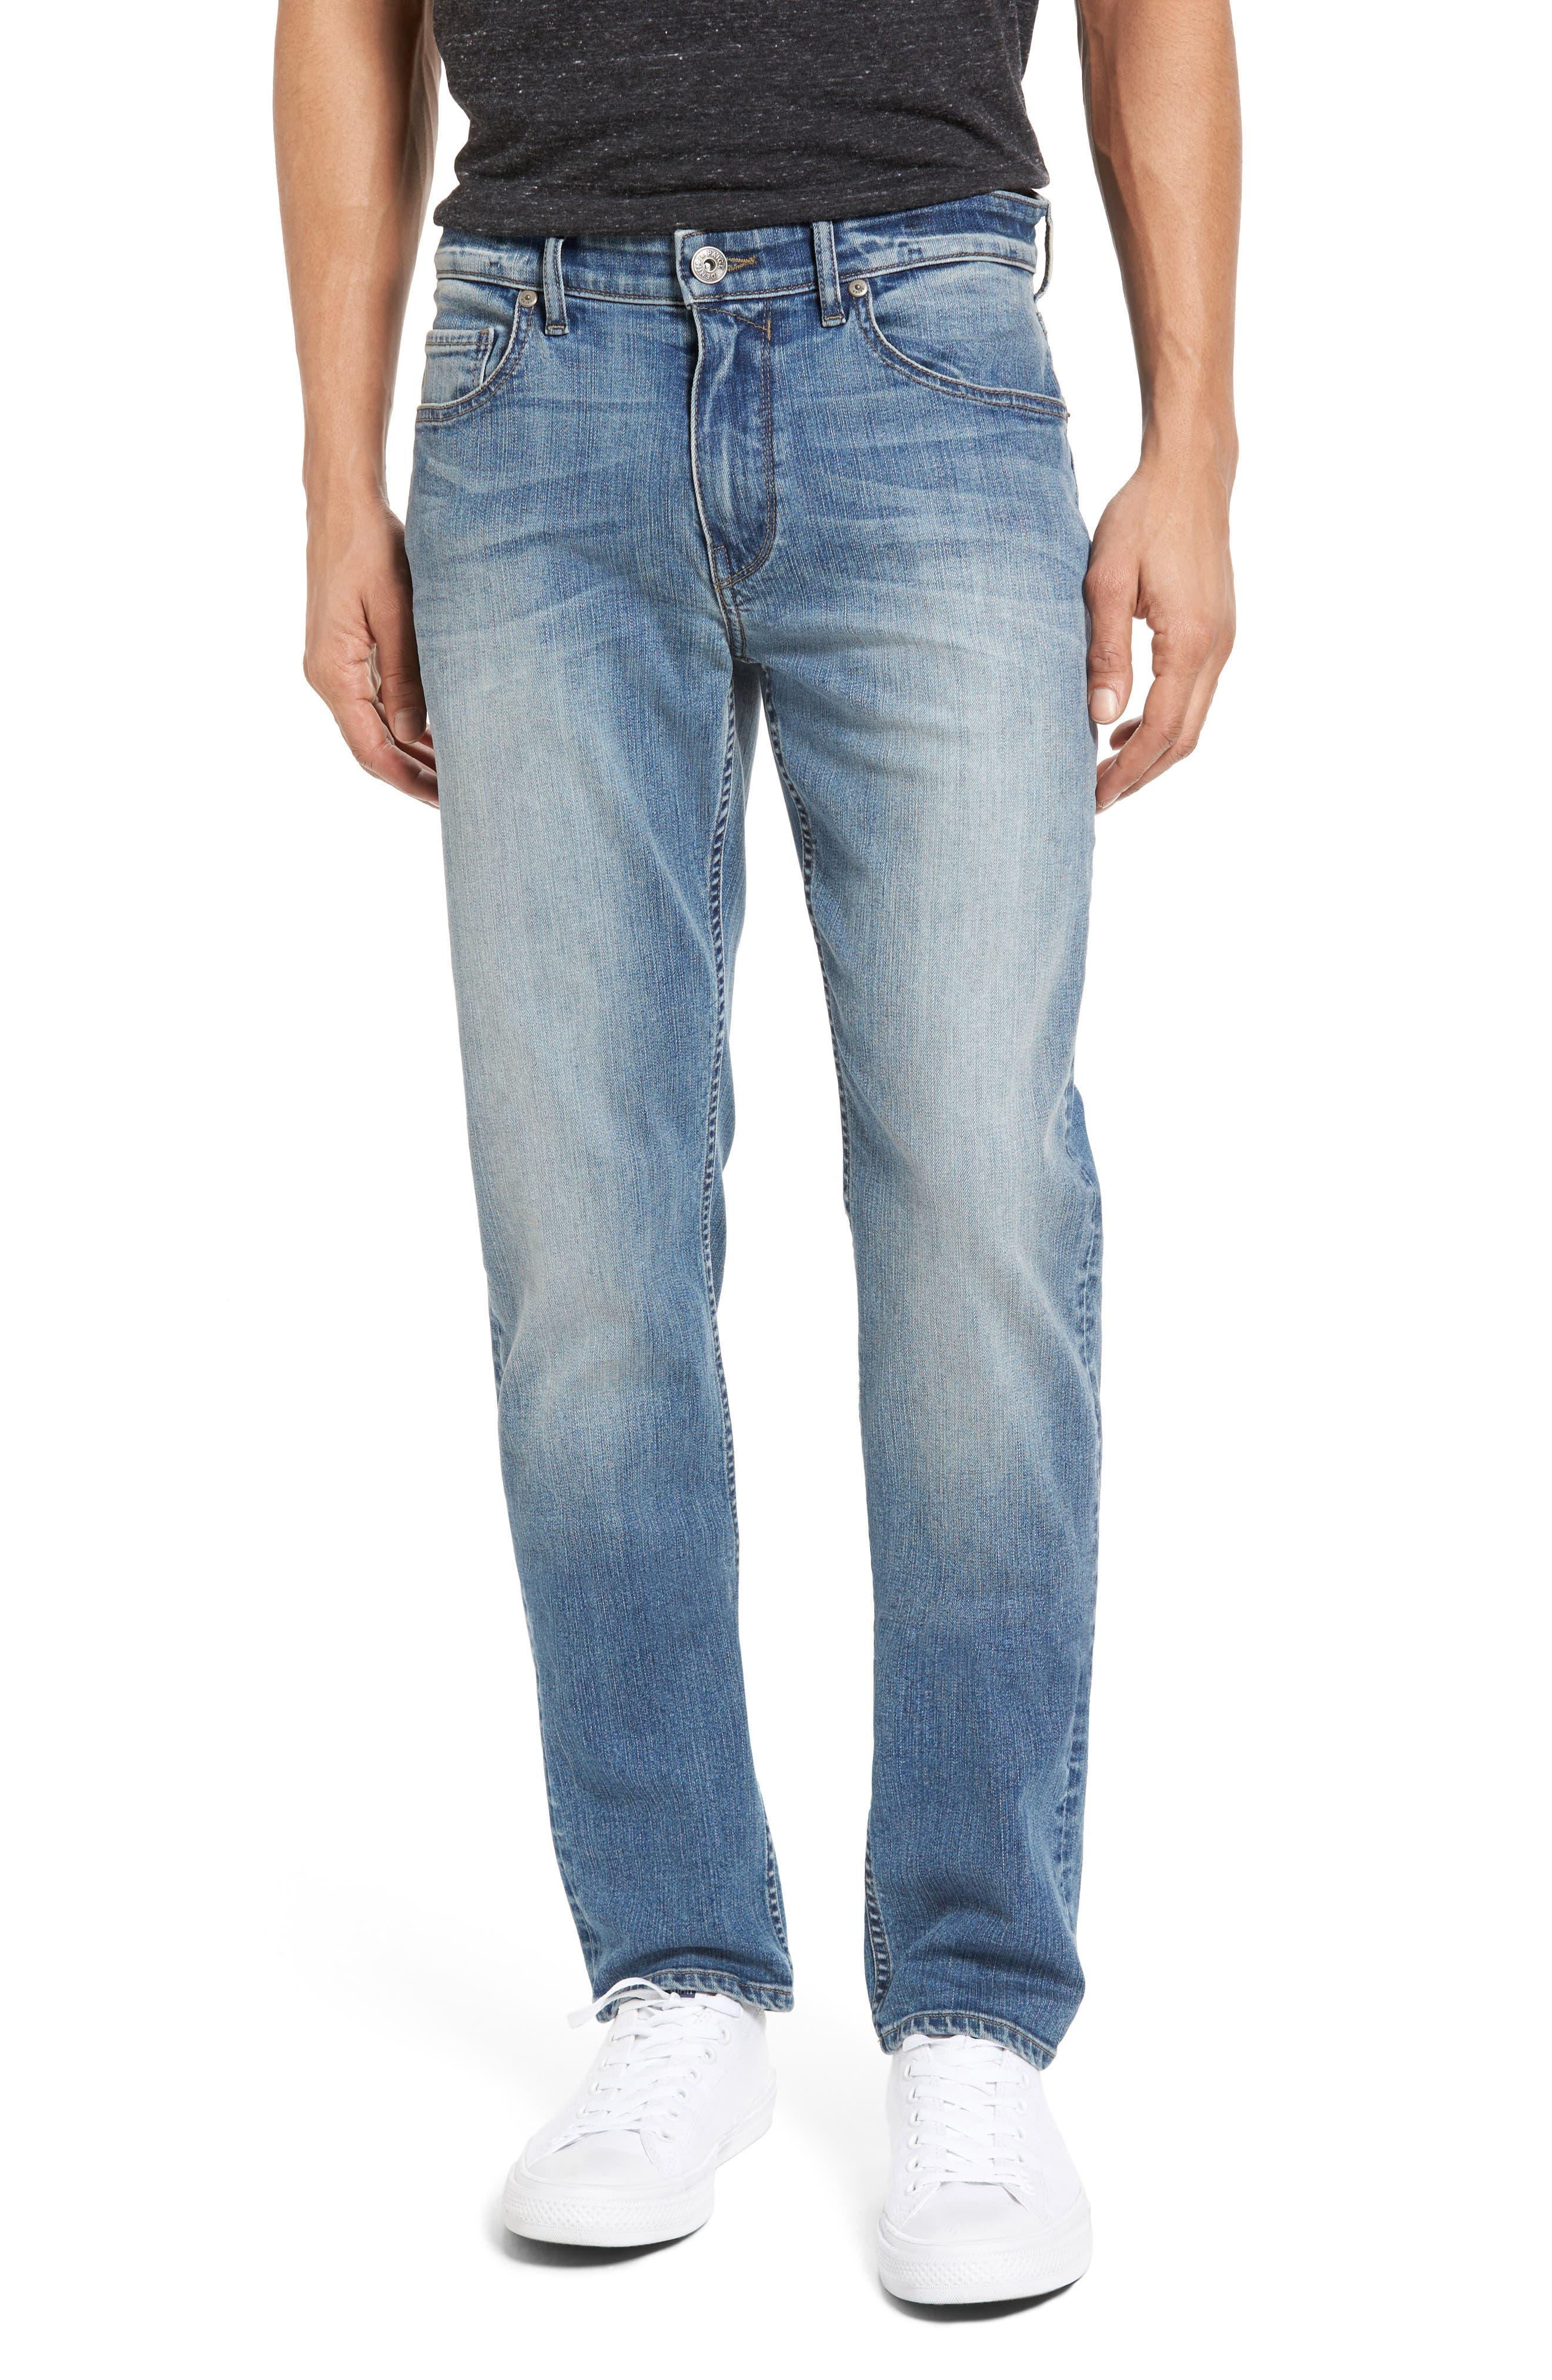 PAIGE Federal LEGACY Slim Straight Leg Jeans (Jesse)